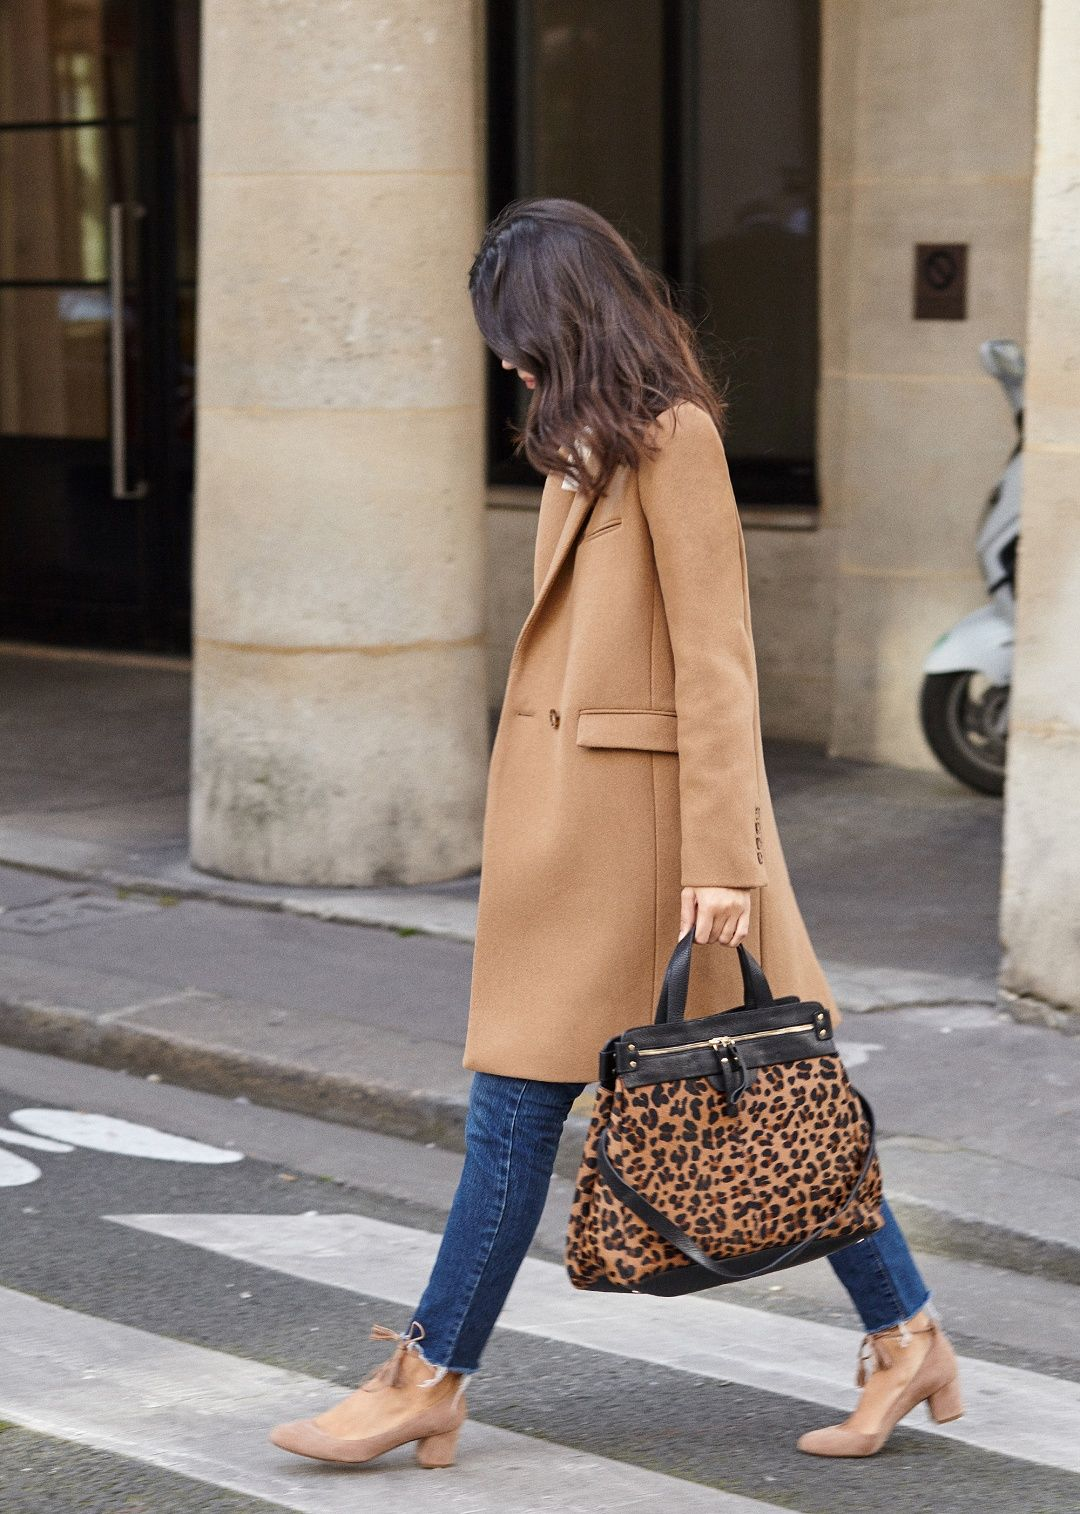 Cute Coats for Fall & Winter